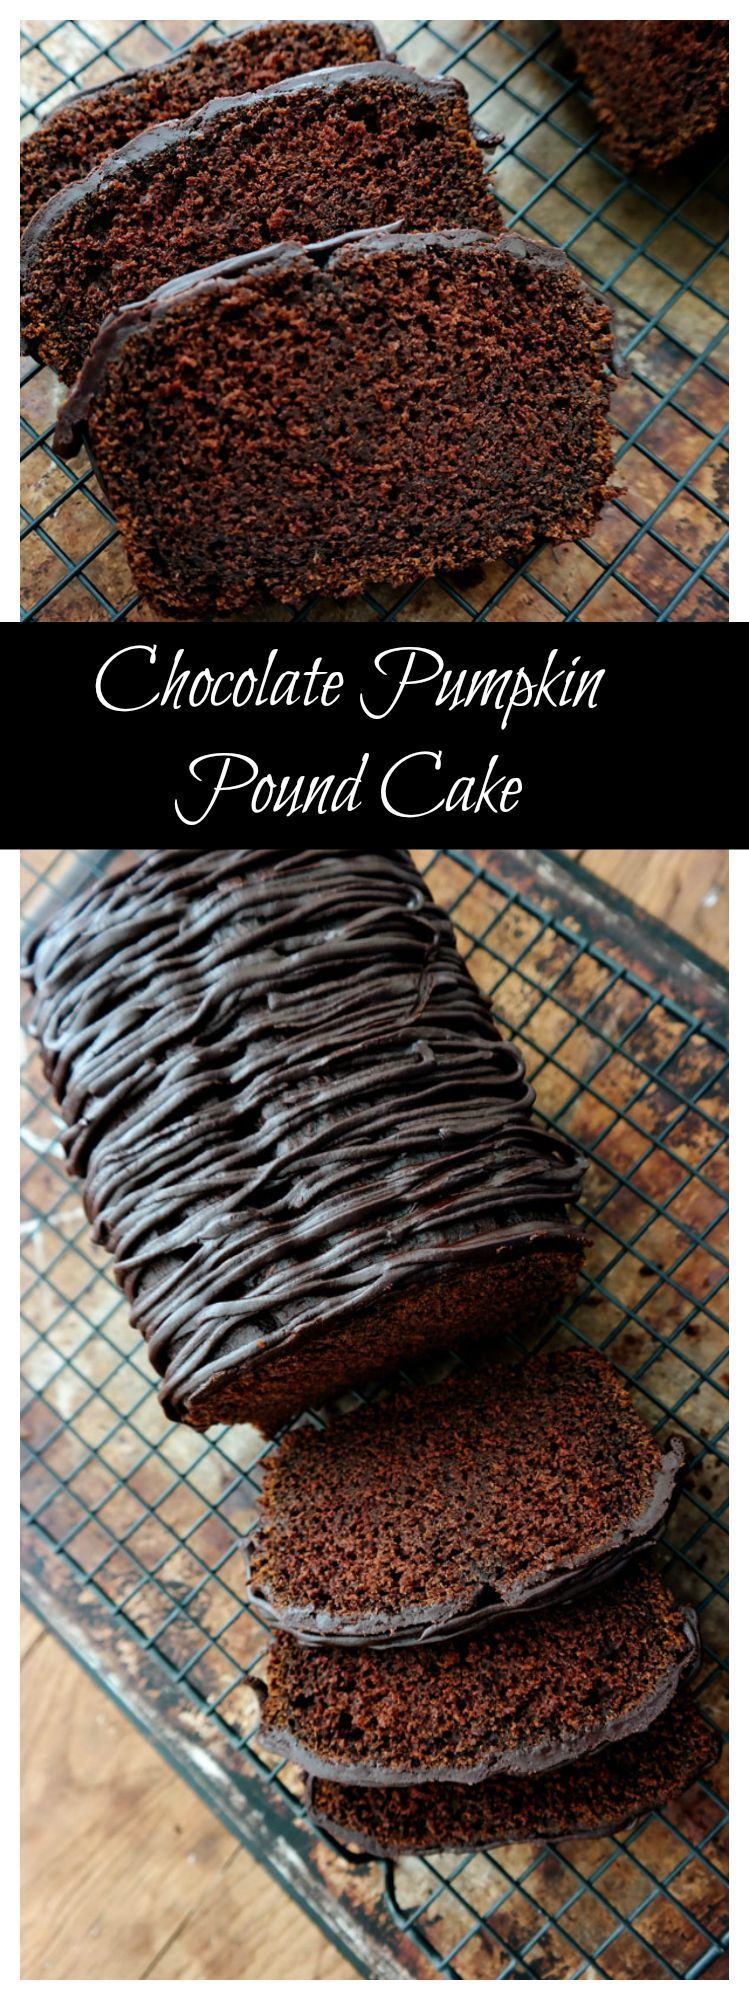 Chocolate pumpkin pound cake reciperich moist with just